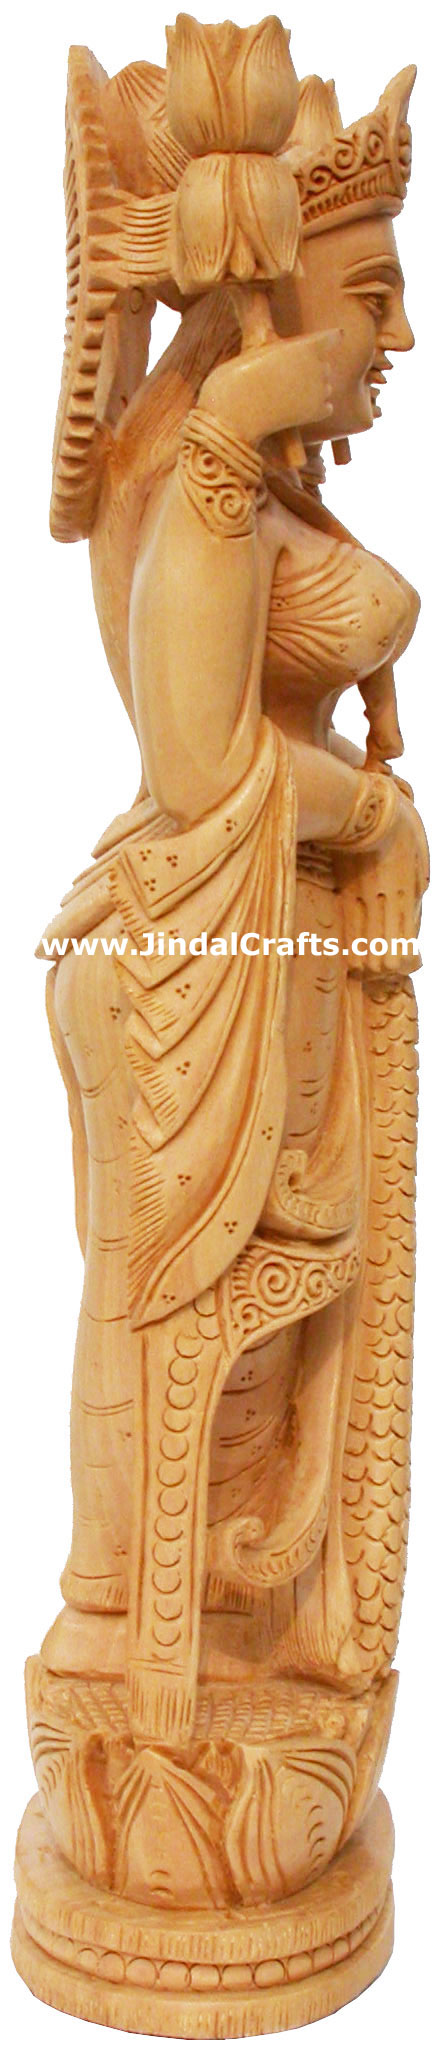 Hindu deities goddess lakshmi india wood carving arts